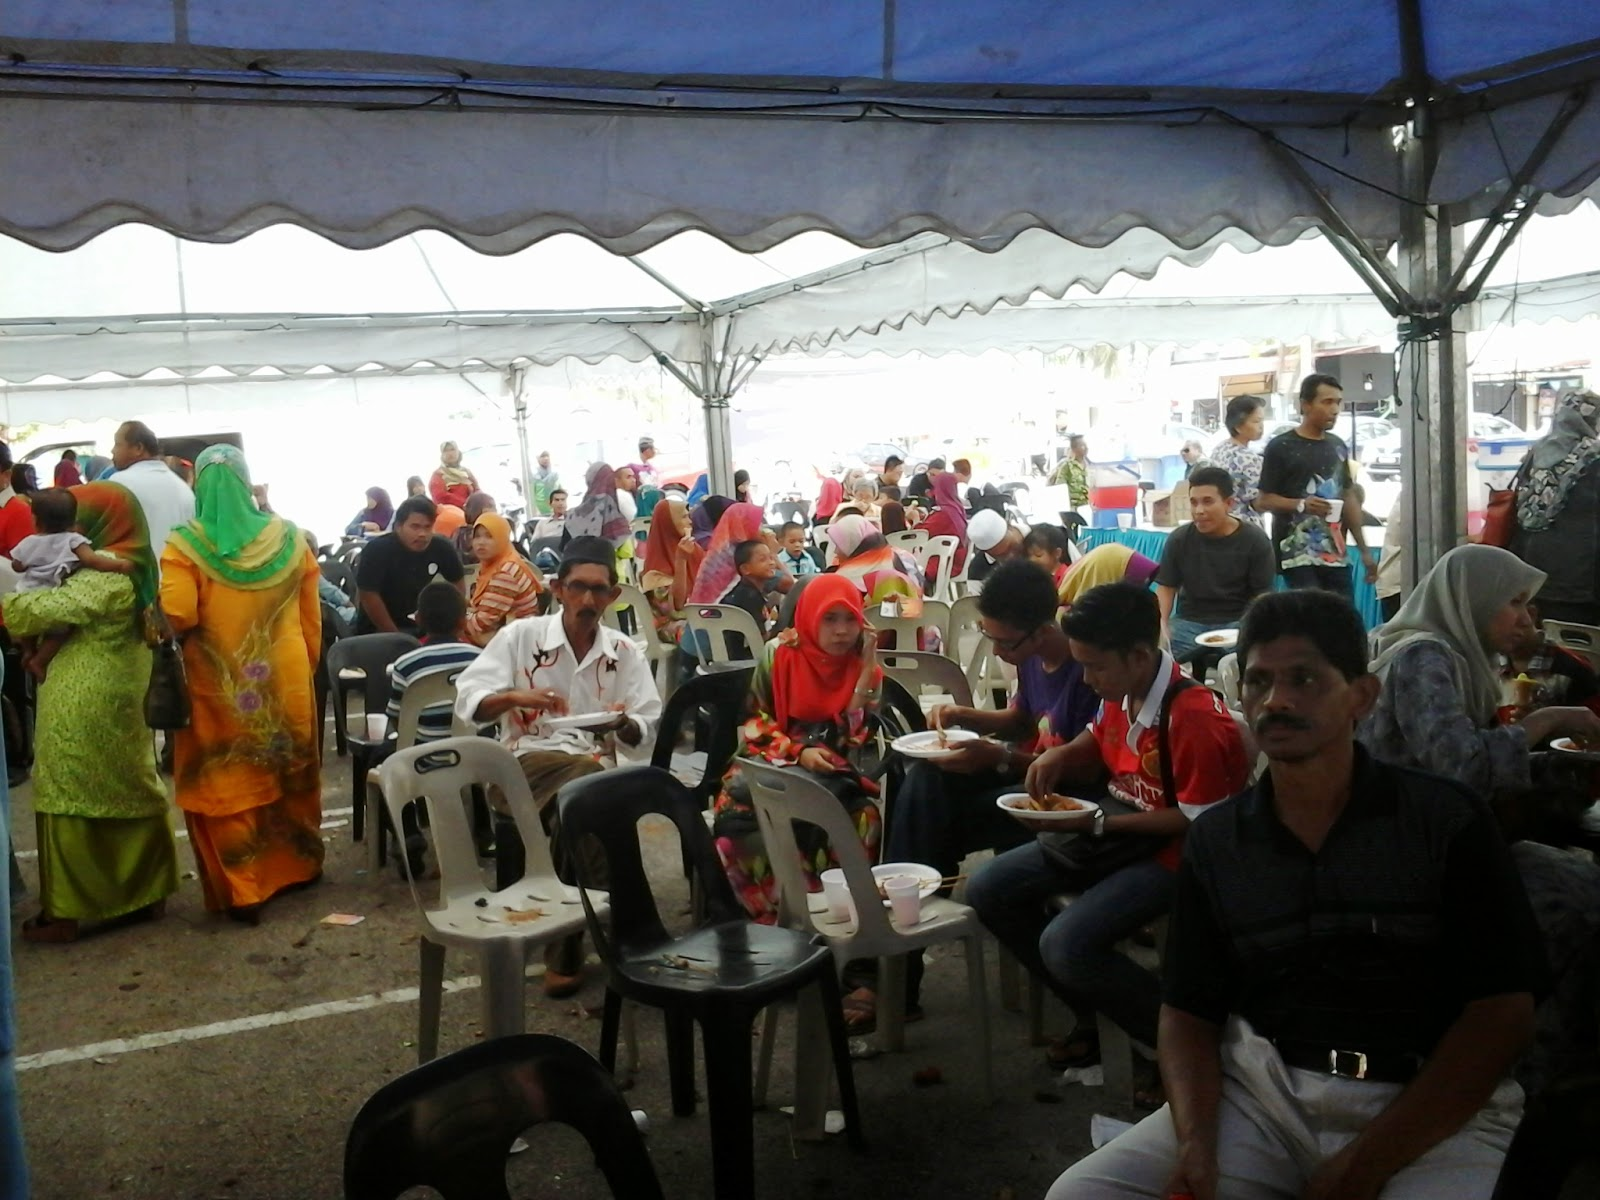 adun kuala besut|yb tengku zaihan bin che ku abd rahman|Majlis Rumah Terbuka Hari Raya  Aidilfitri  Dun Kuala Besut,